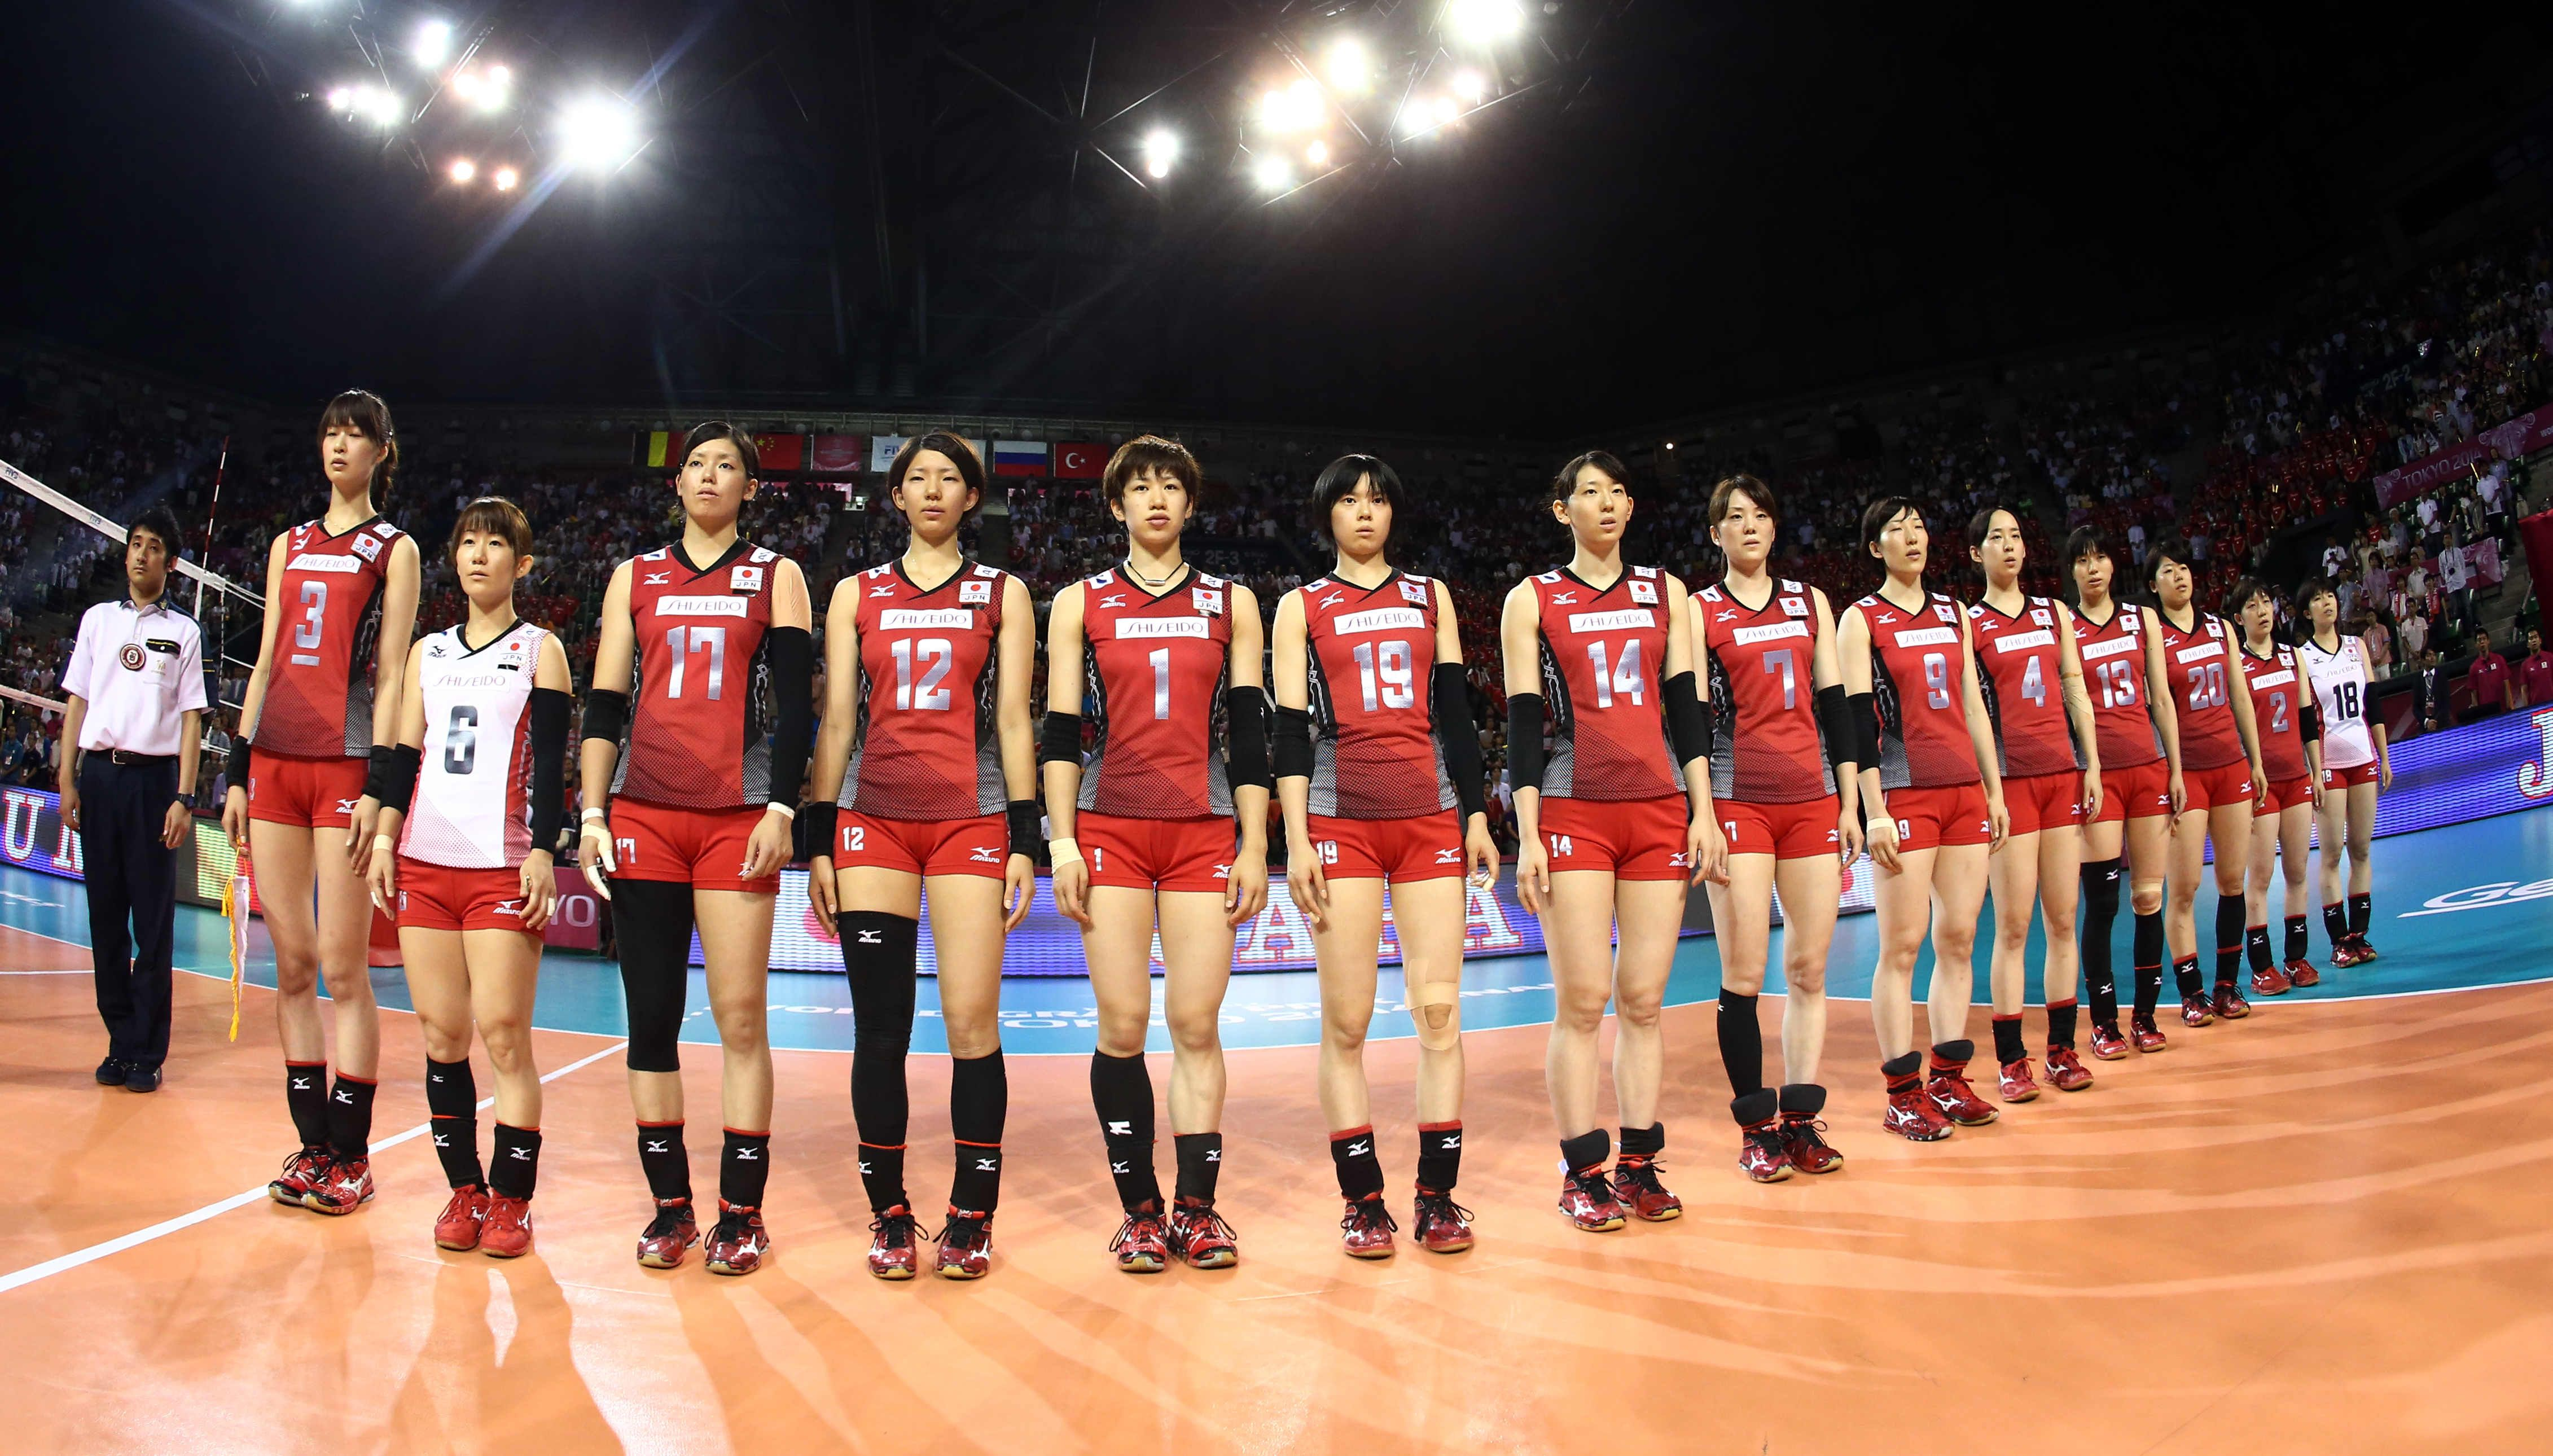 Saori Kimura Miyu Nagaoka Yuko Sano Risa Shinnabe Haruka Miyashita Japan Volleyball Japan Volleyball Team Volleyball Team Volleyball